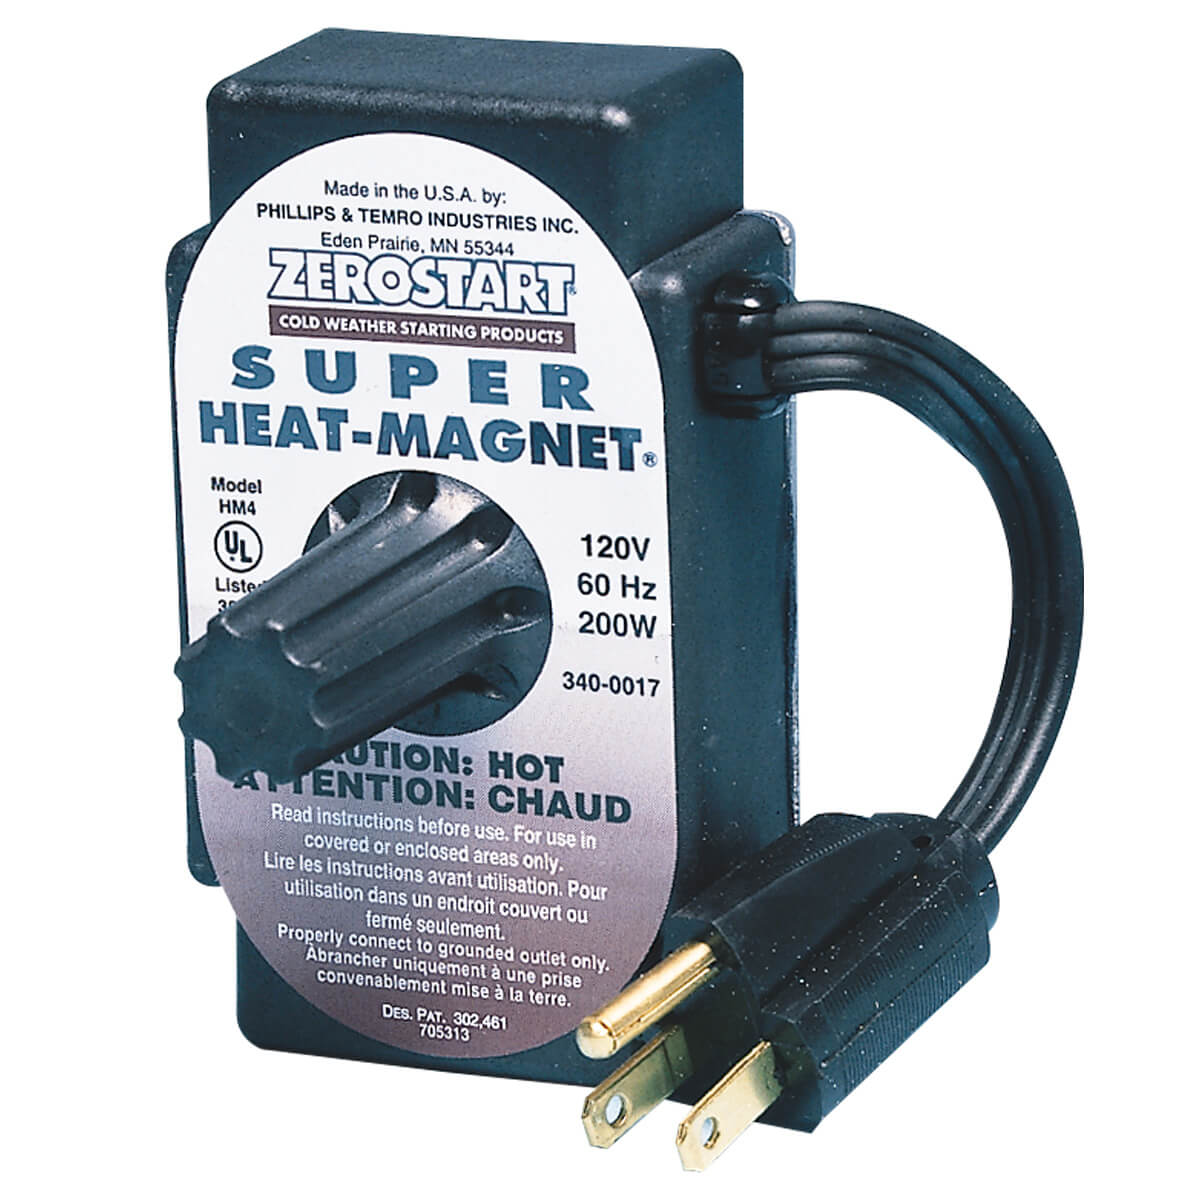 Magnetic Super Heater - 200W - 120V